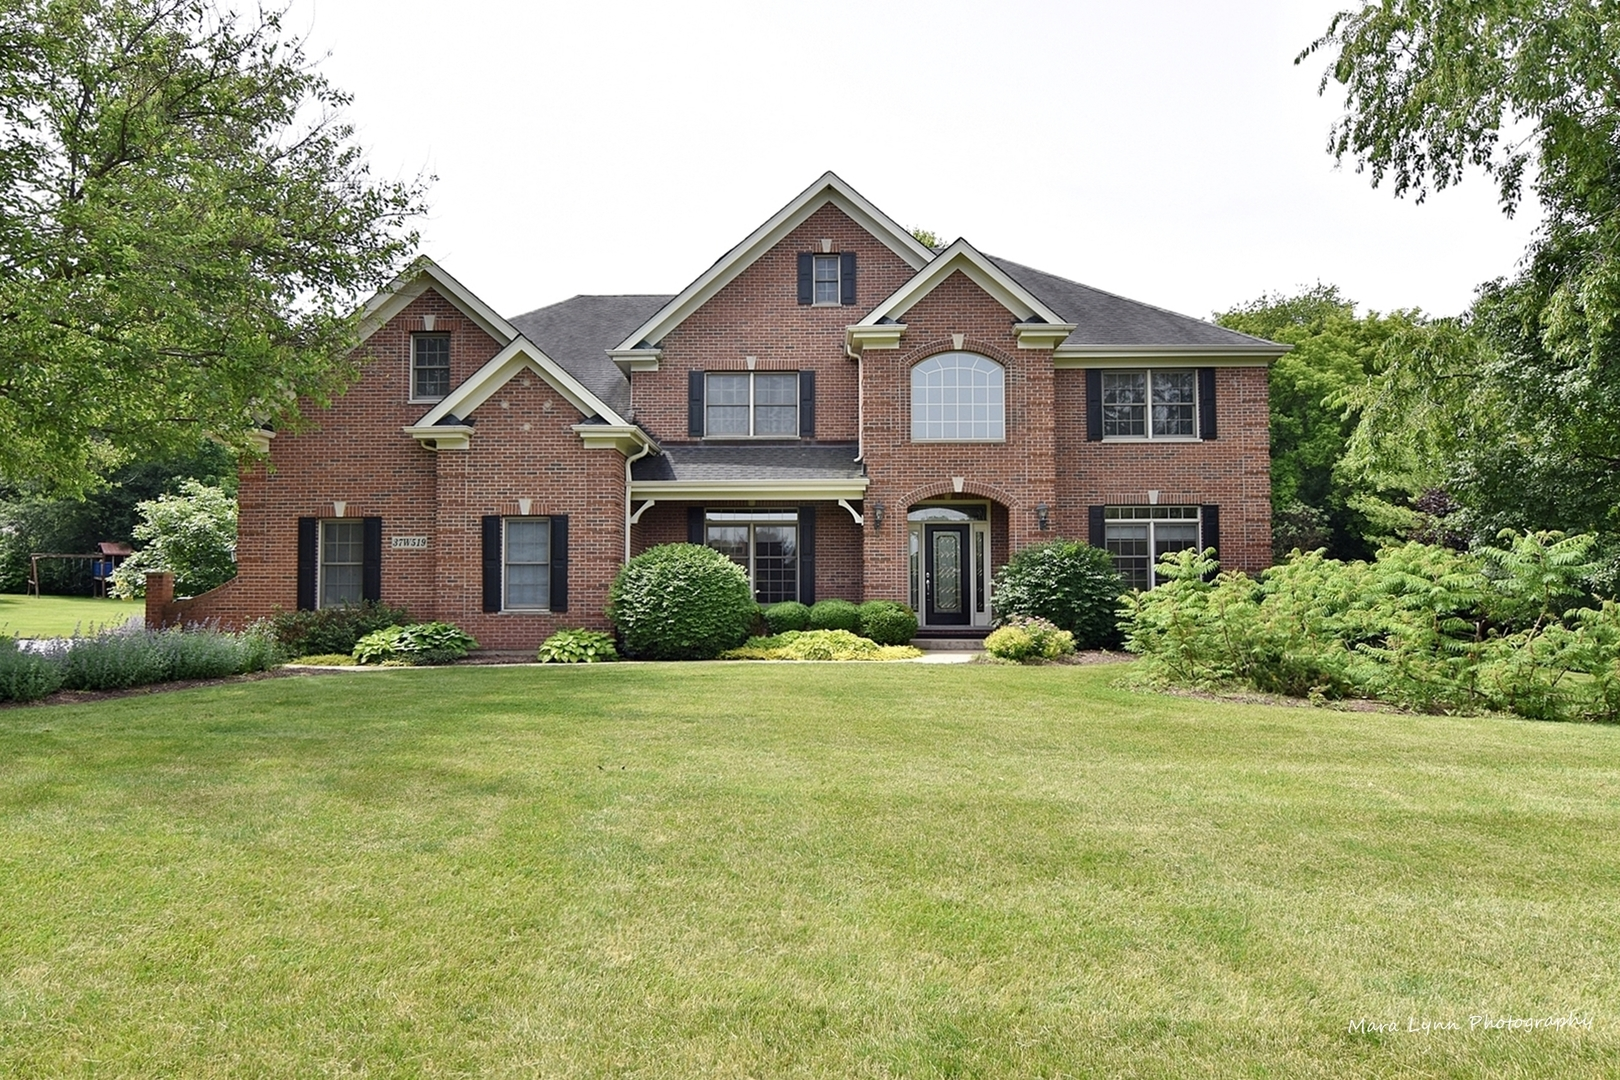 37W519 GREY BARN, ST. CHARLES, Illinois, 60175